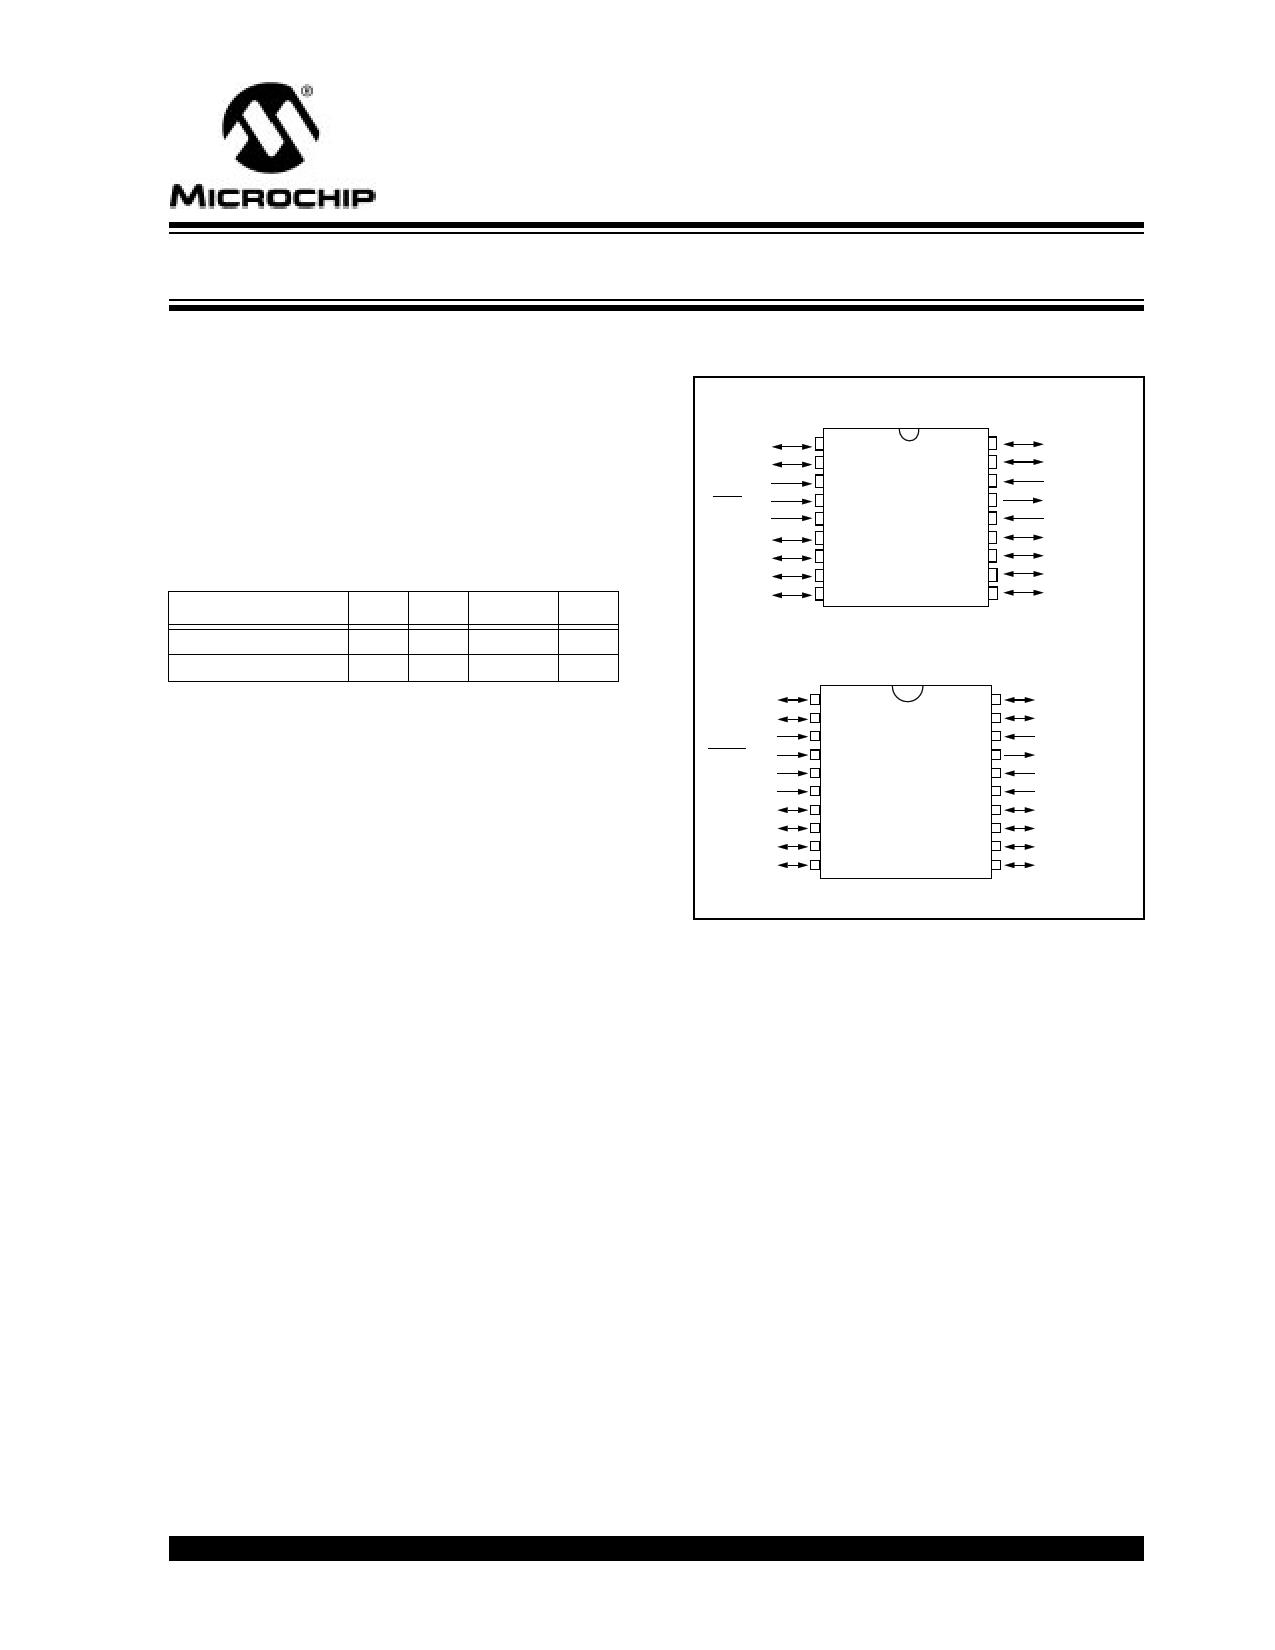 PIC16LV58A datasheet